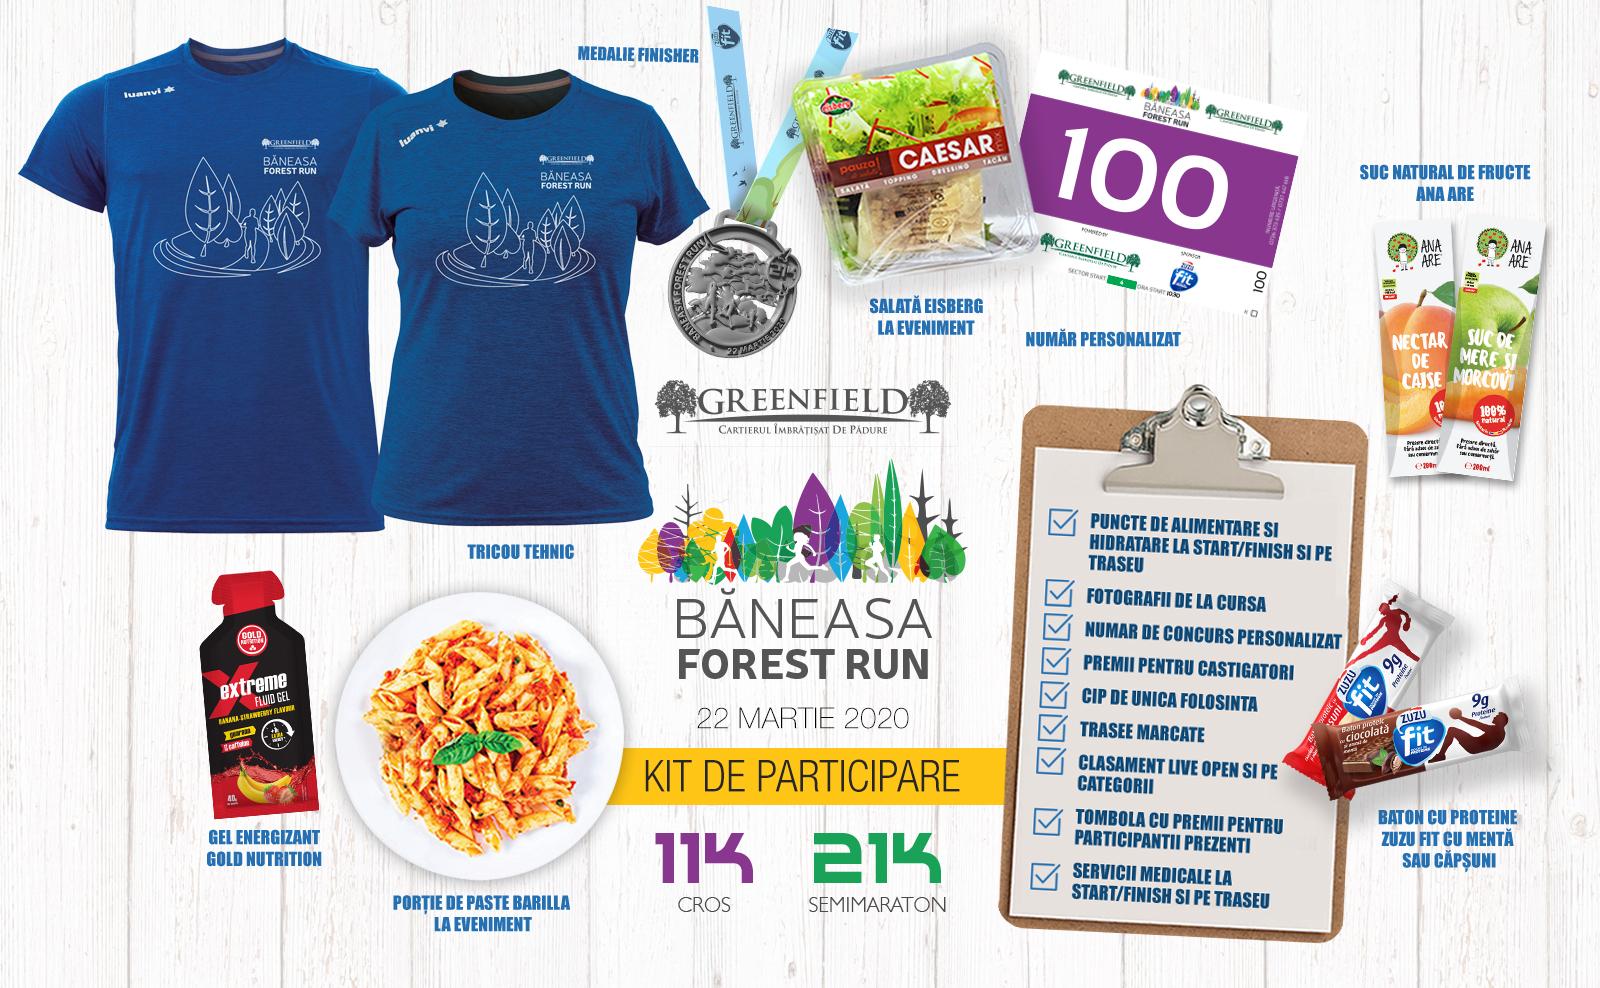 Baneasa Forest Run - kit participare cros și semimaraton